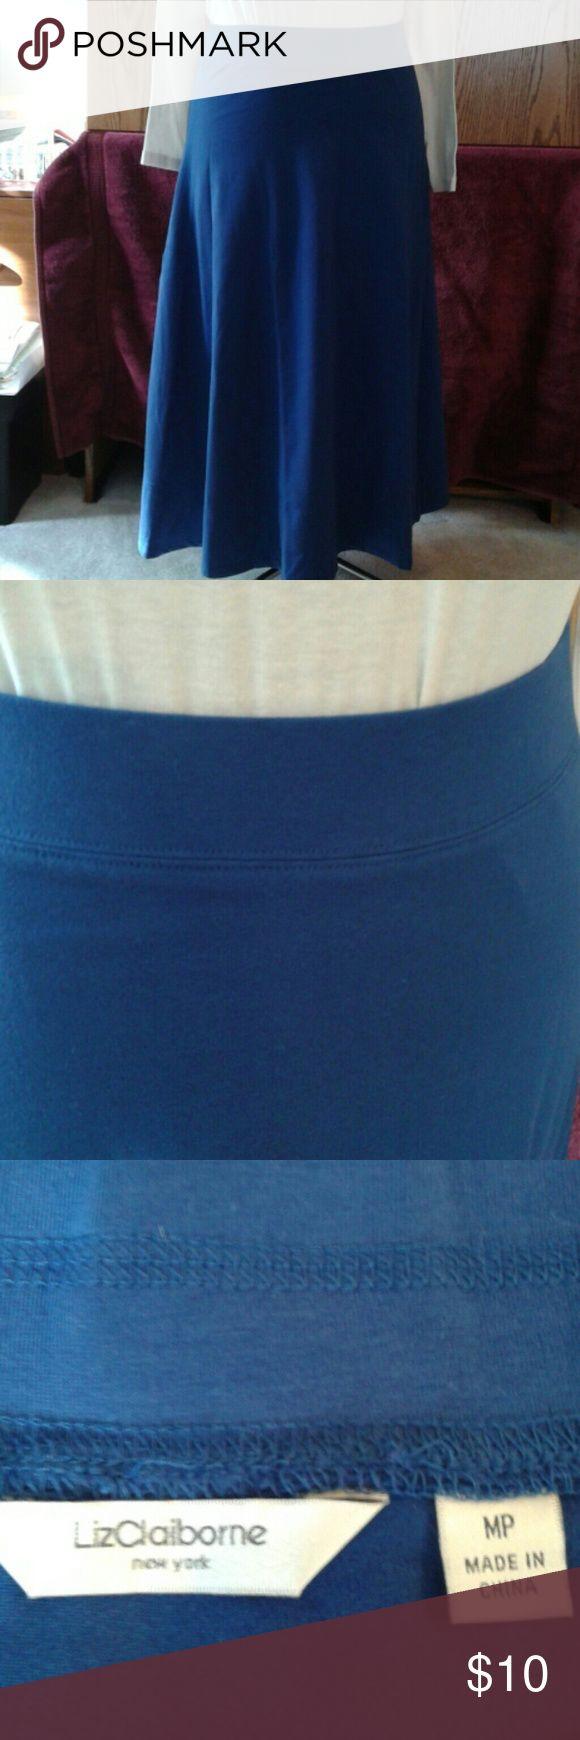 Navy blue maxi skirt NWOT Liz Claiborne New York navy blue maxi skirt Liz Claiborne New York Skirts Maxi